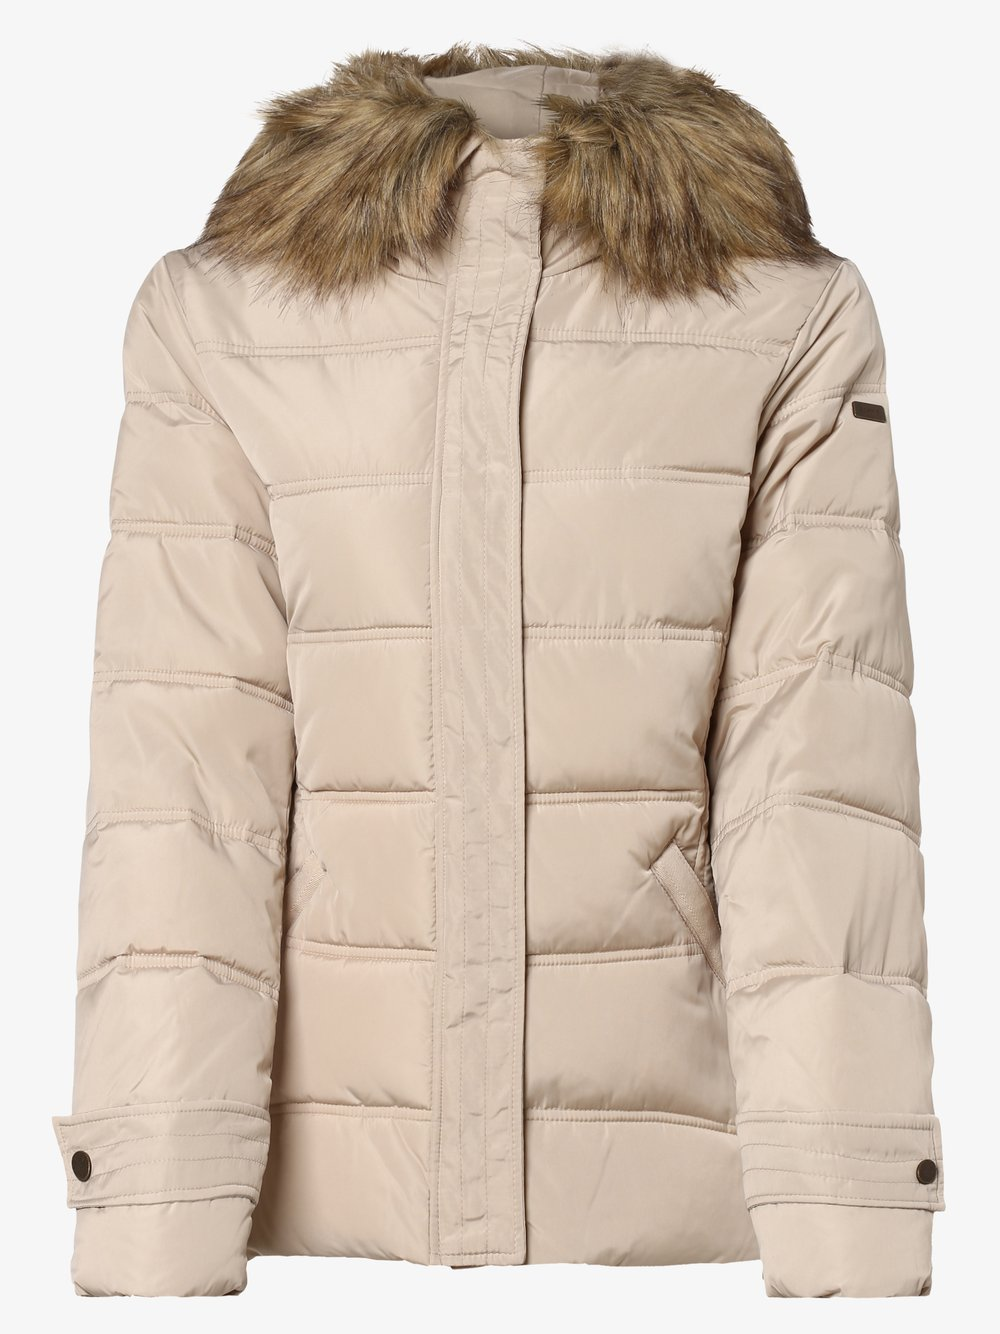 Esprit Casual - Damska kurtka pikowana, beżowy